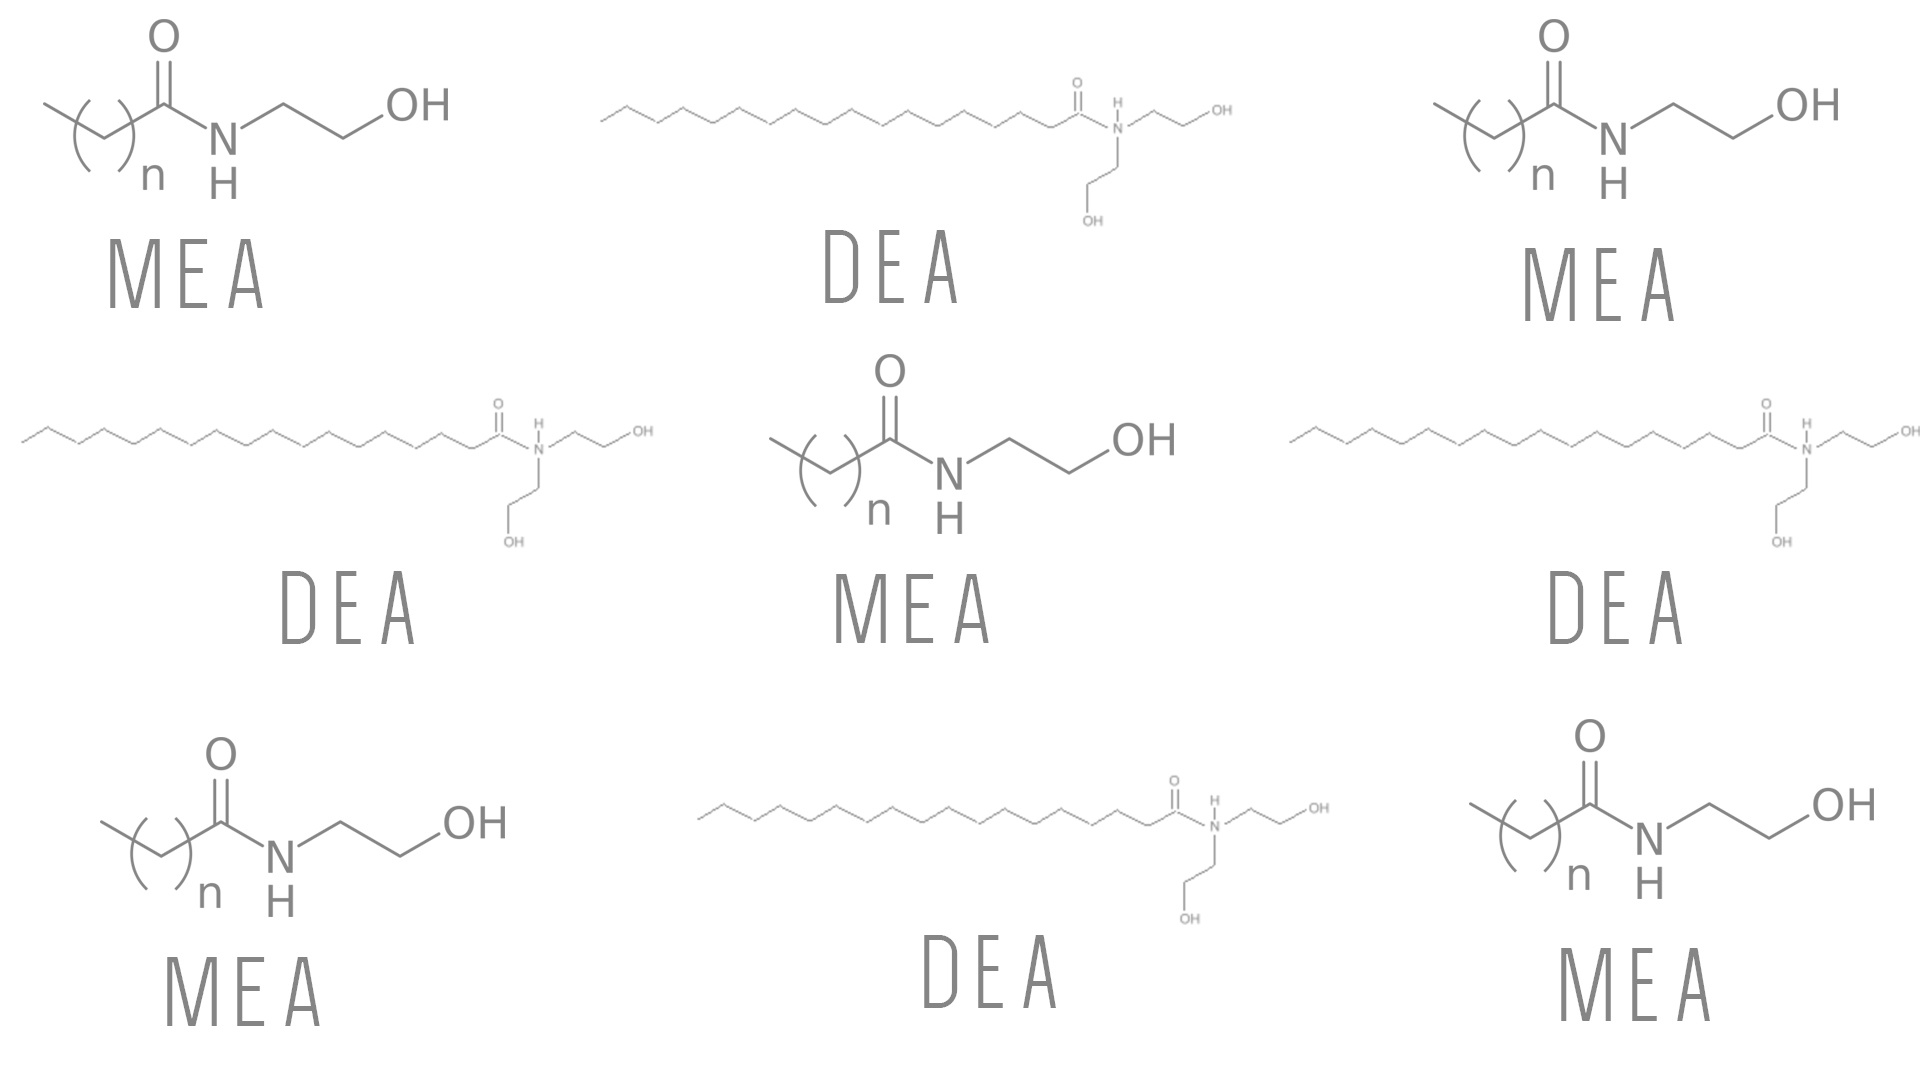 mea&deachemical